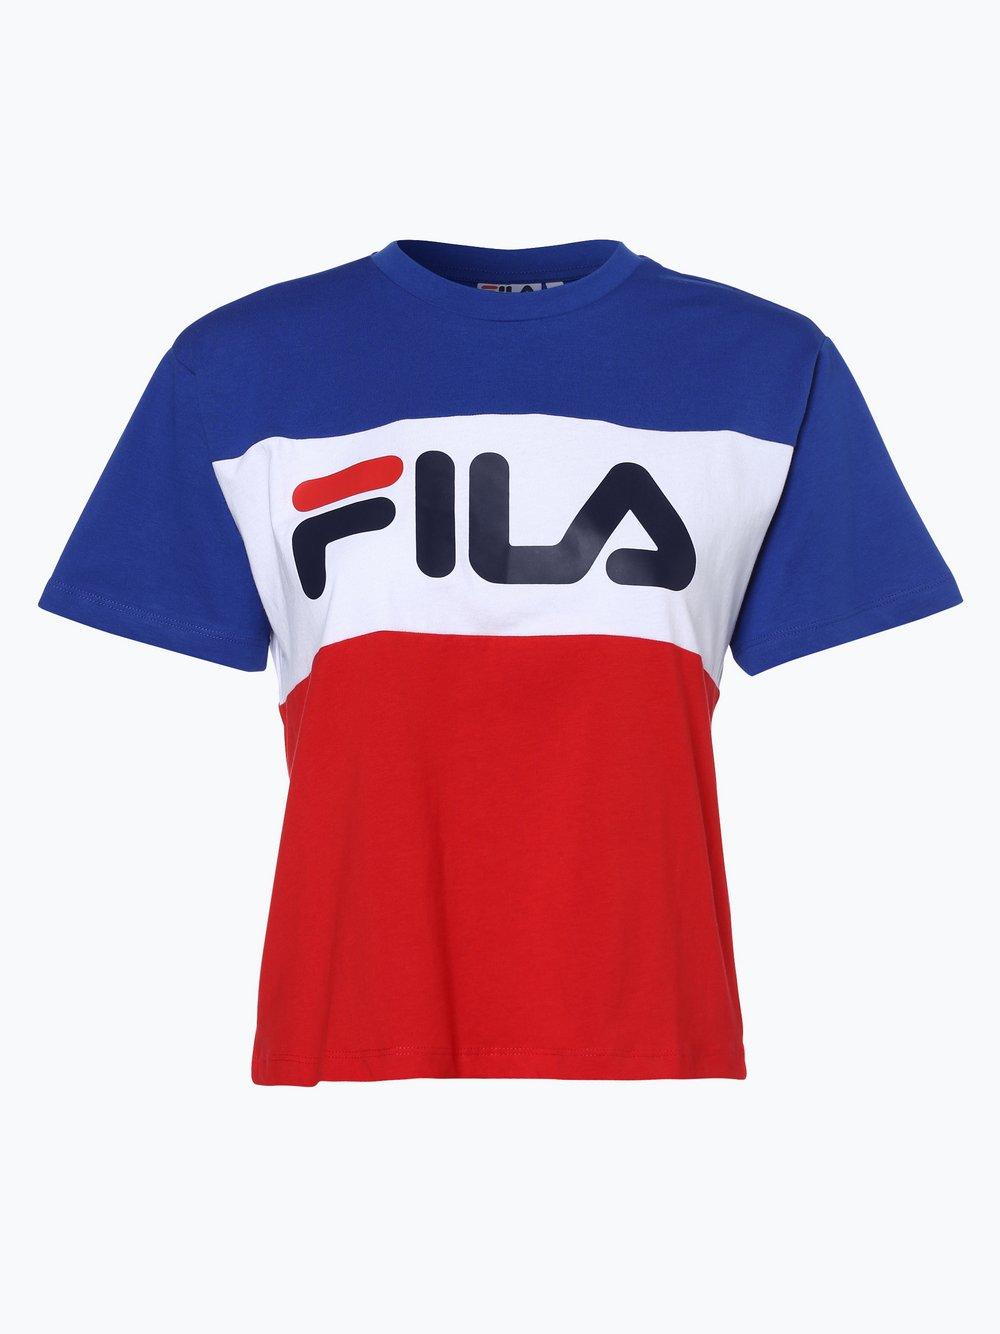 fila t shirt damski